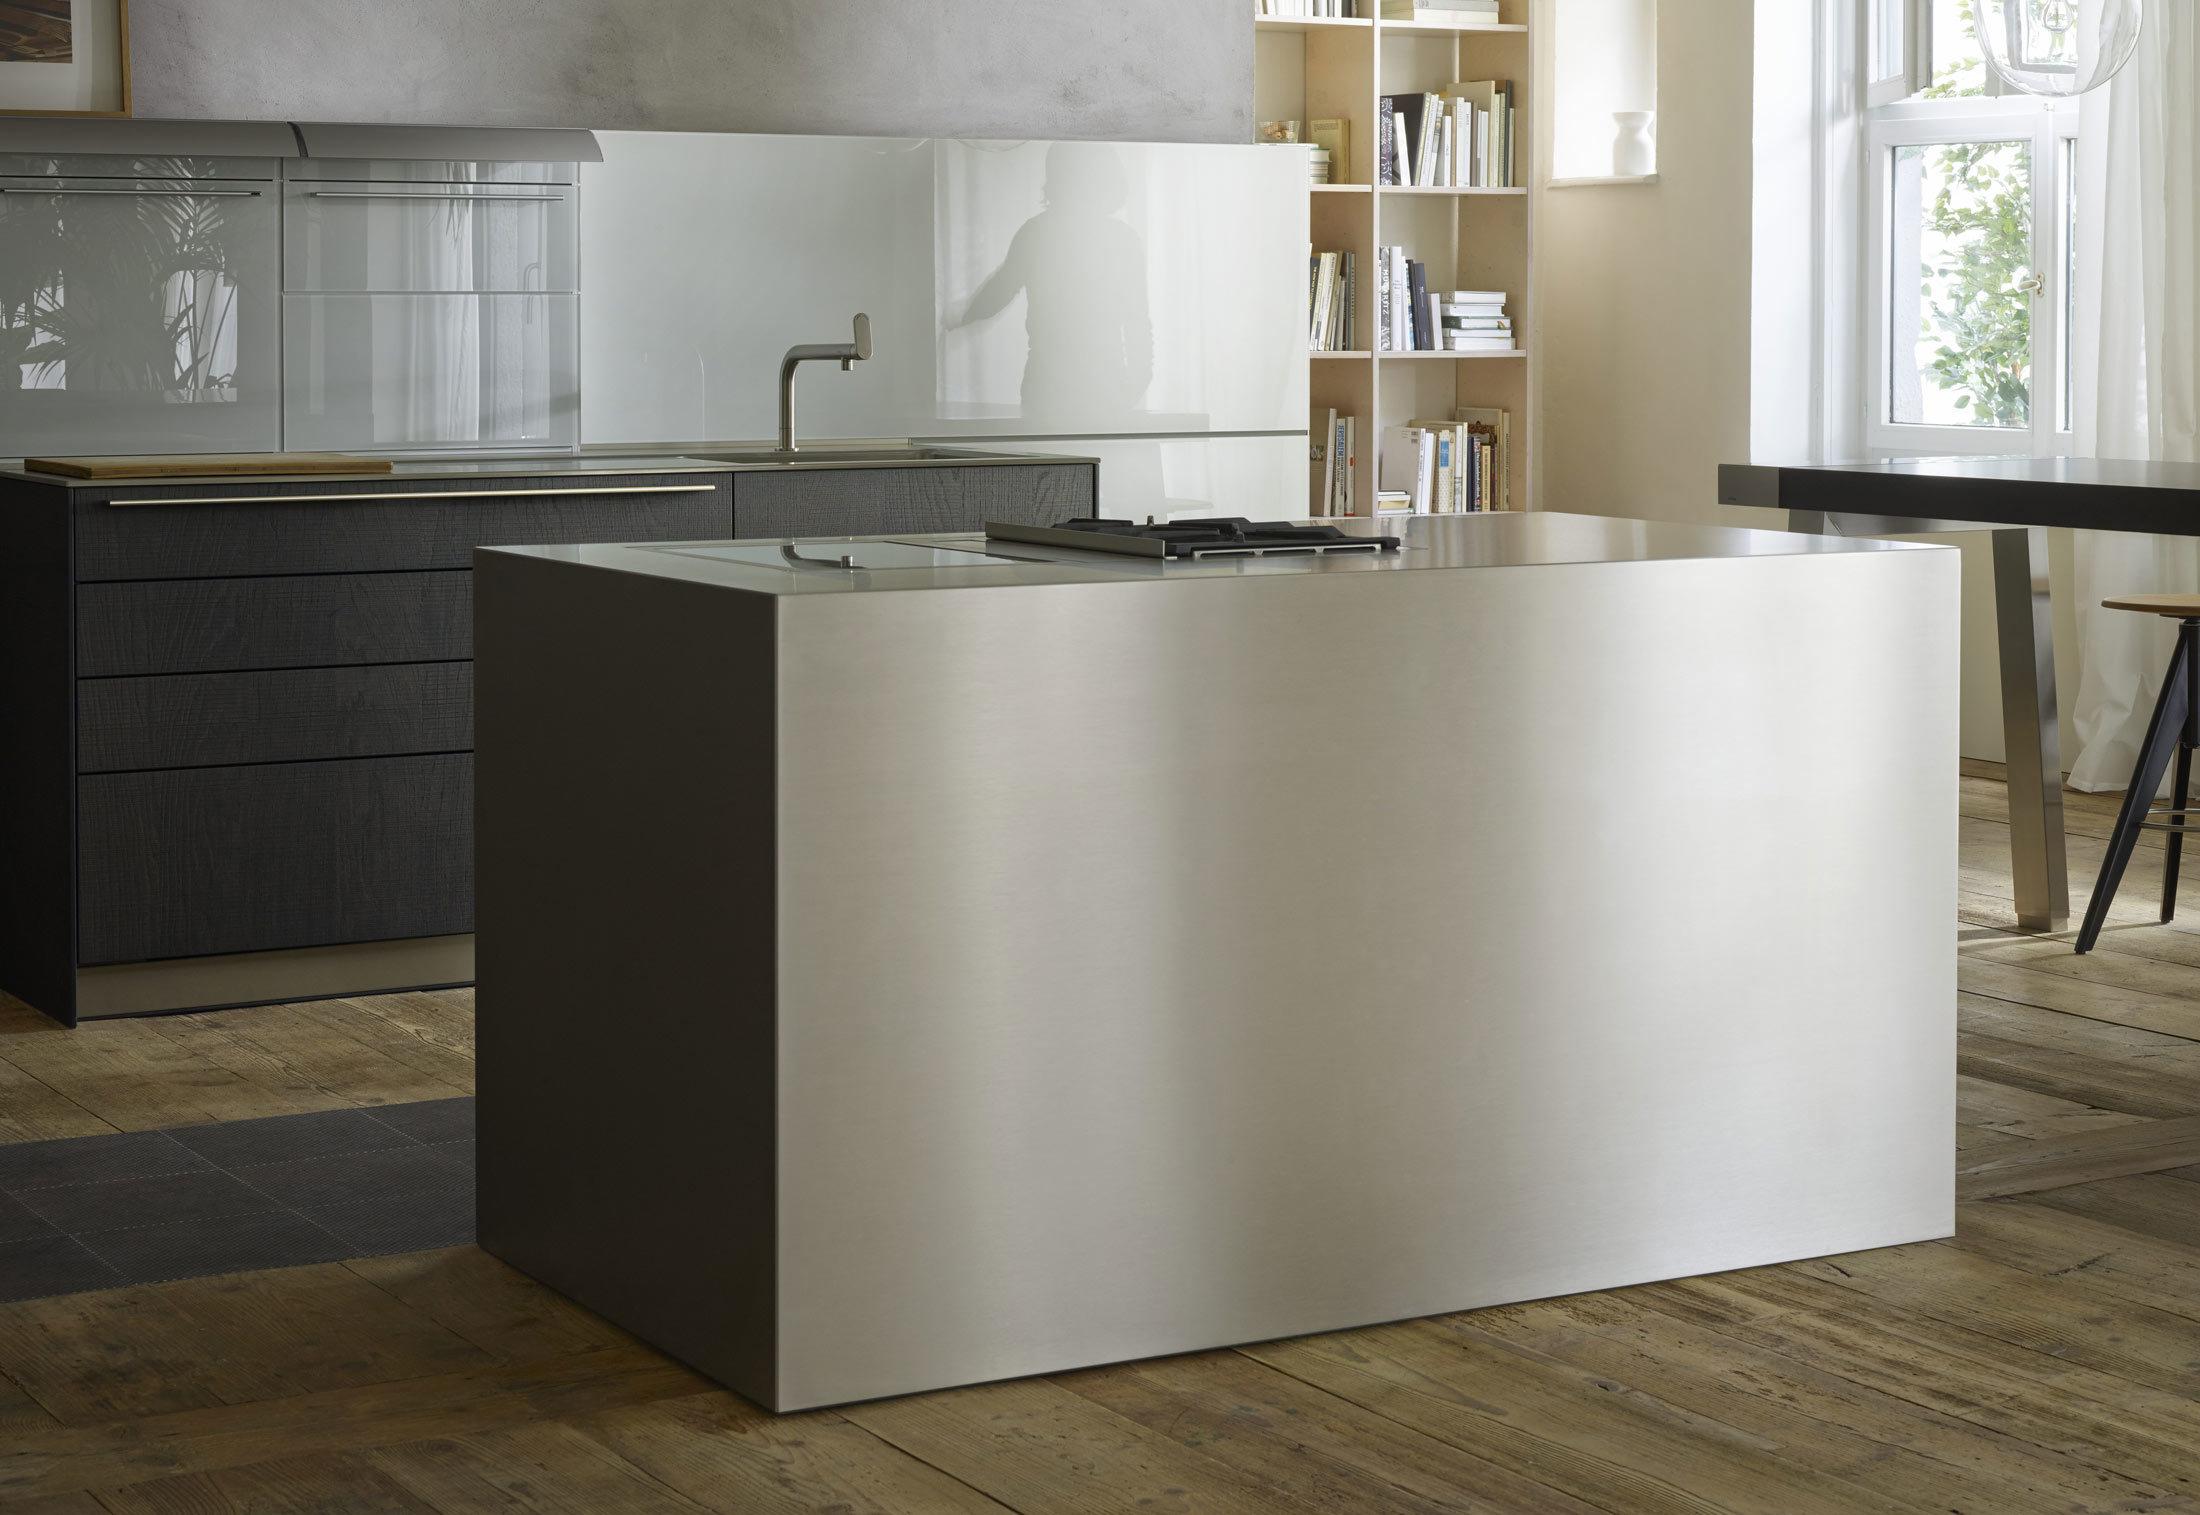 Full Size of Kücheninsel Freistehend Freistehende Küche Wohnzimmer Kücheninsel Freistehend